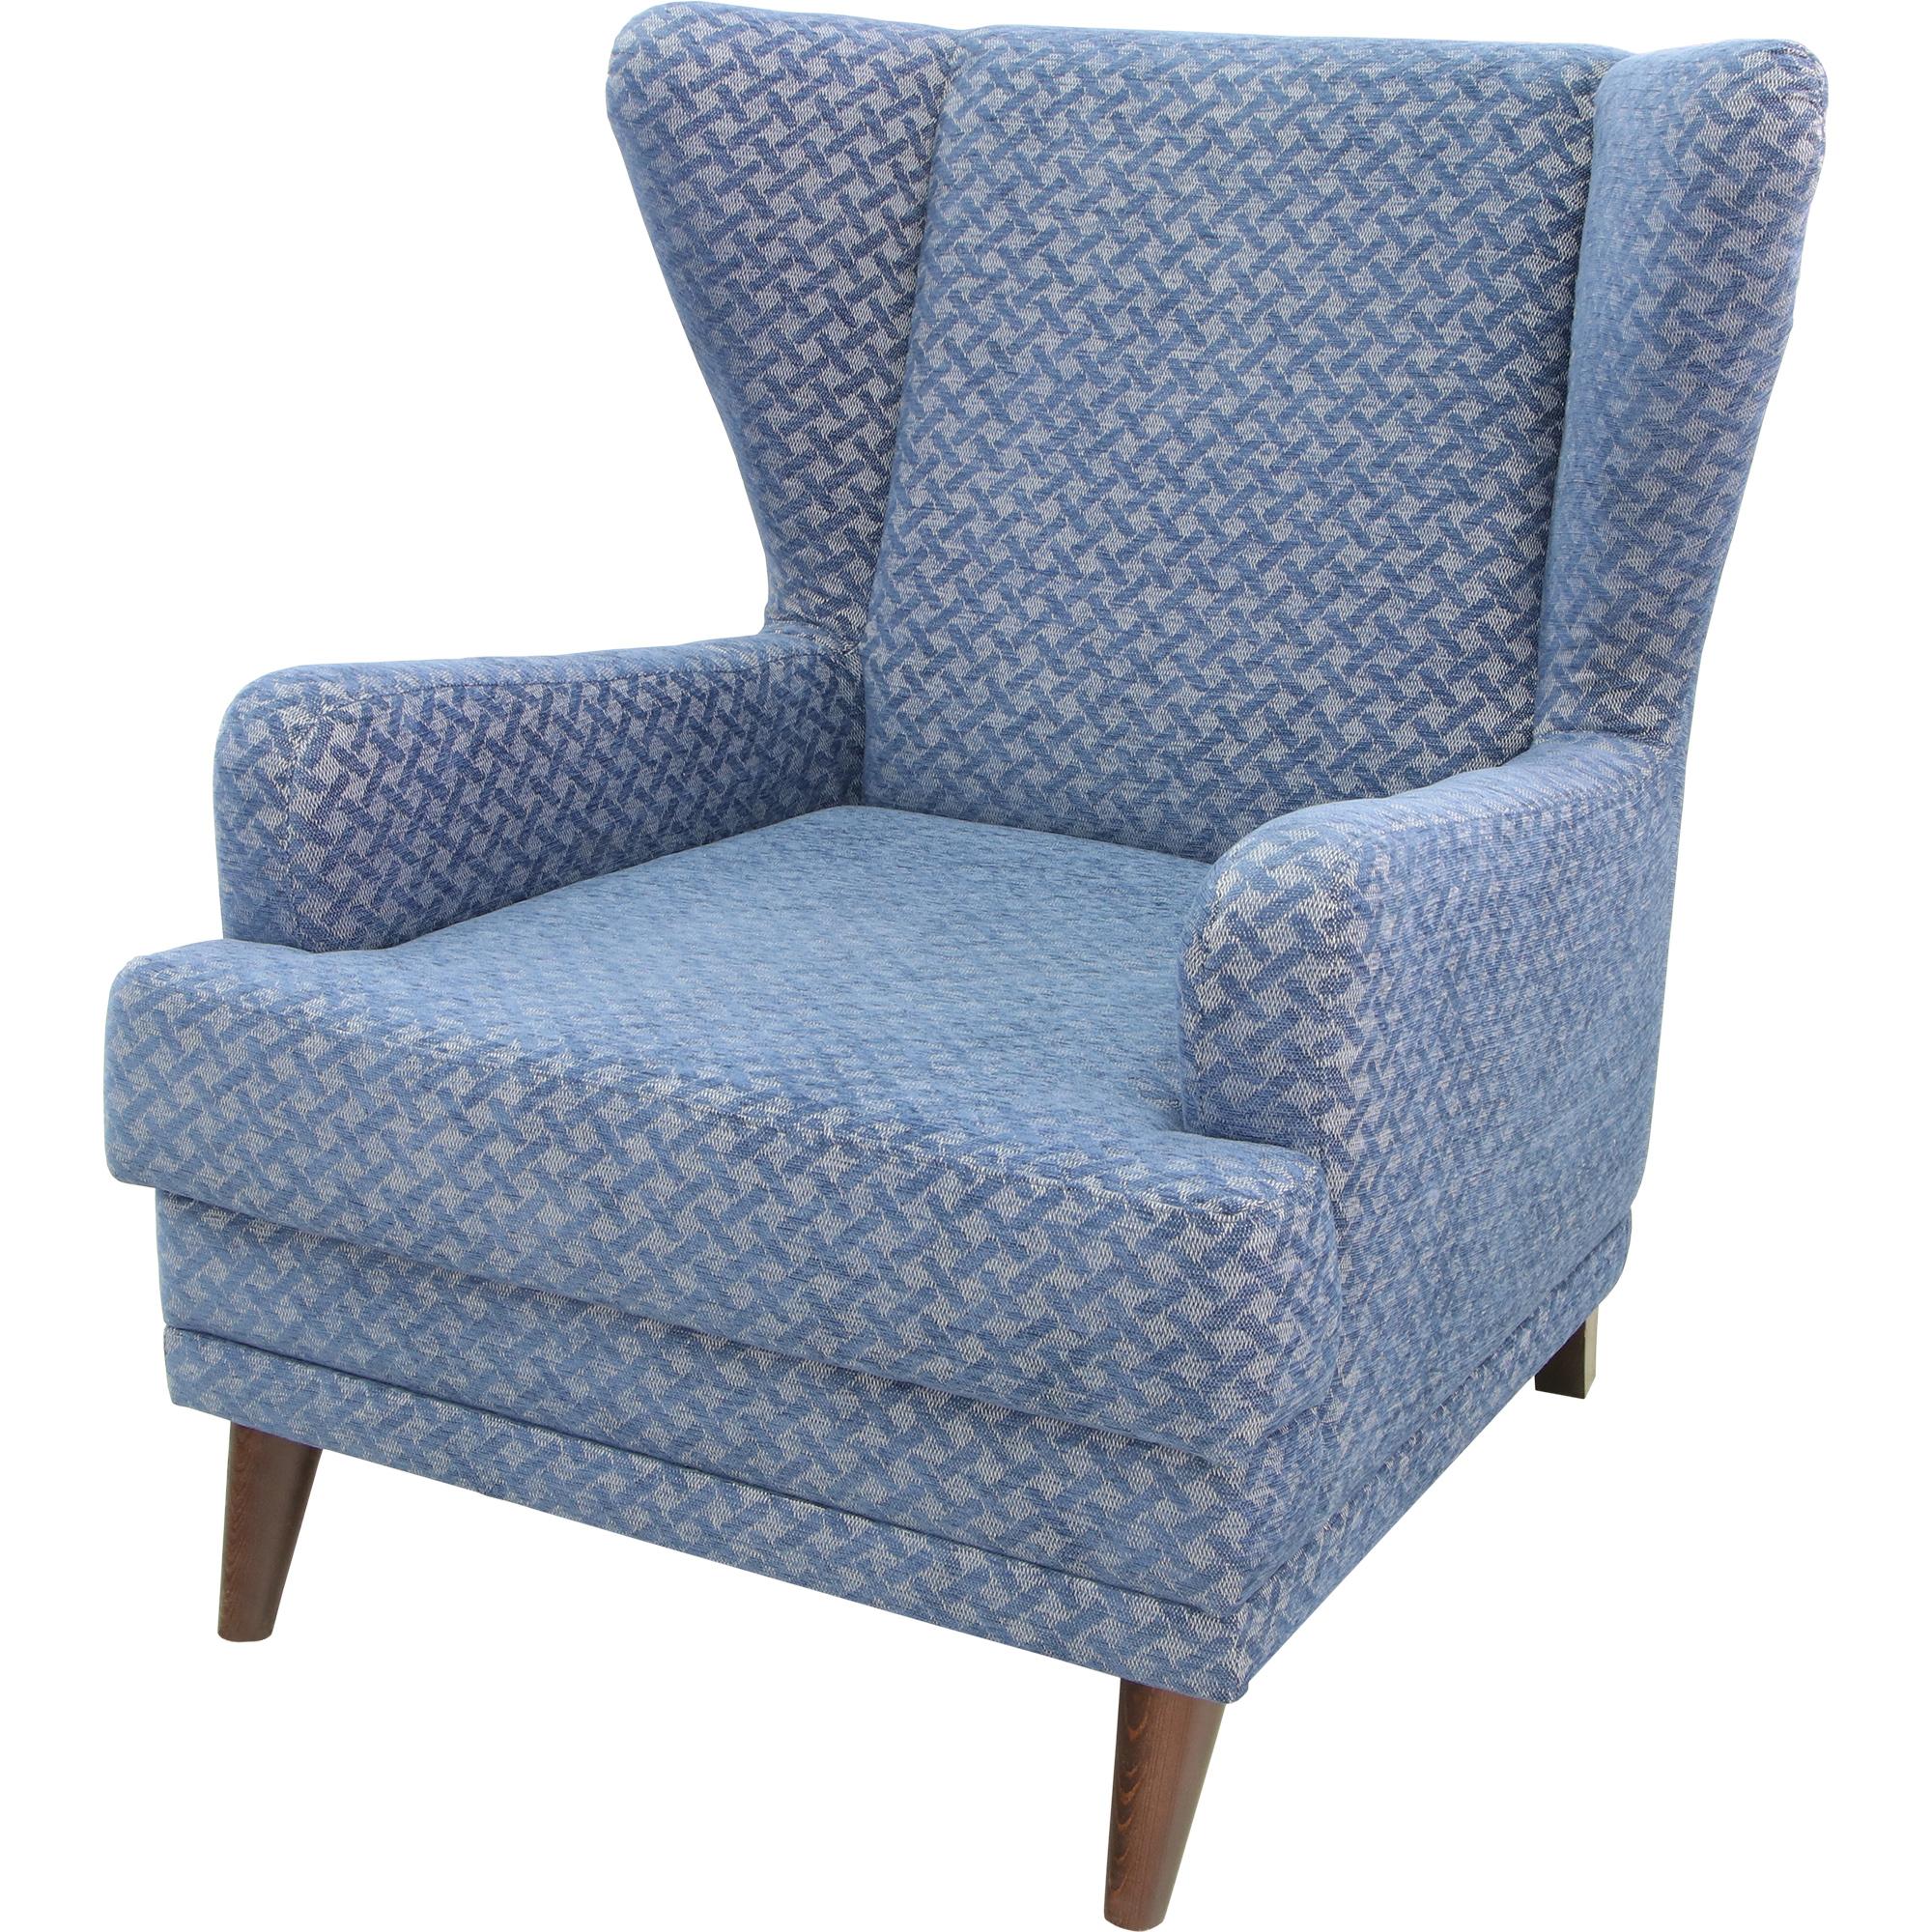 Кресло ФС неваех 74x90x91 синее без механизма